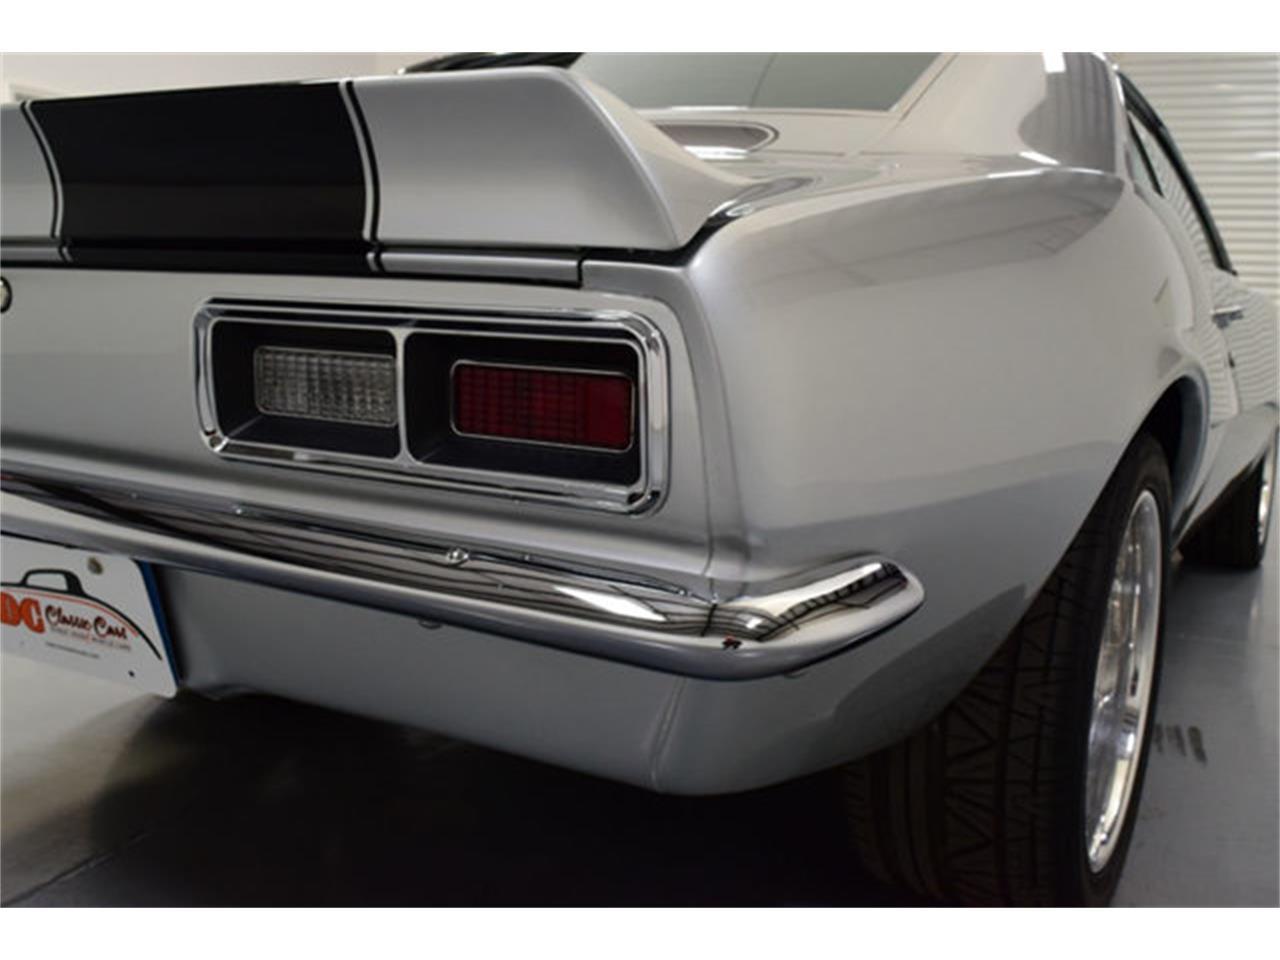 Large Picture of '68 Camaro located in North Carolina - $79,995.00 - LG6F